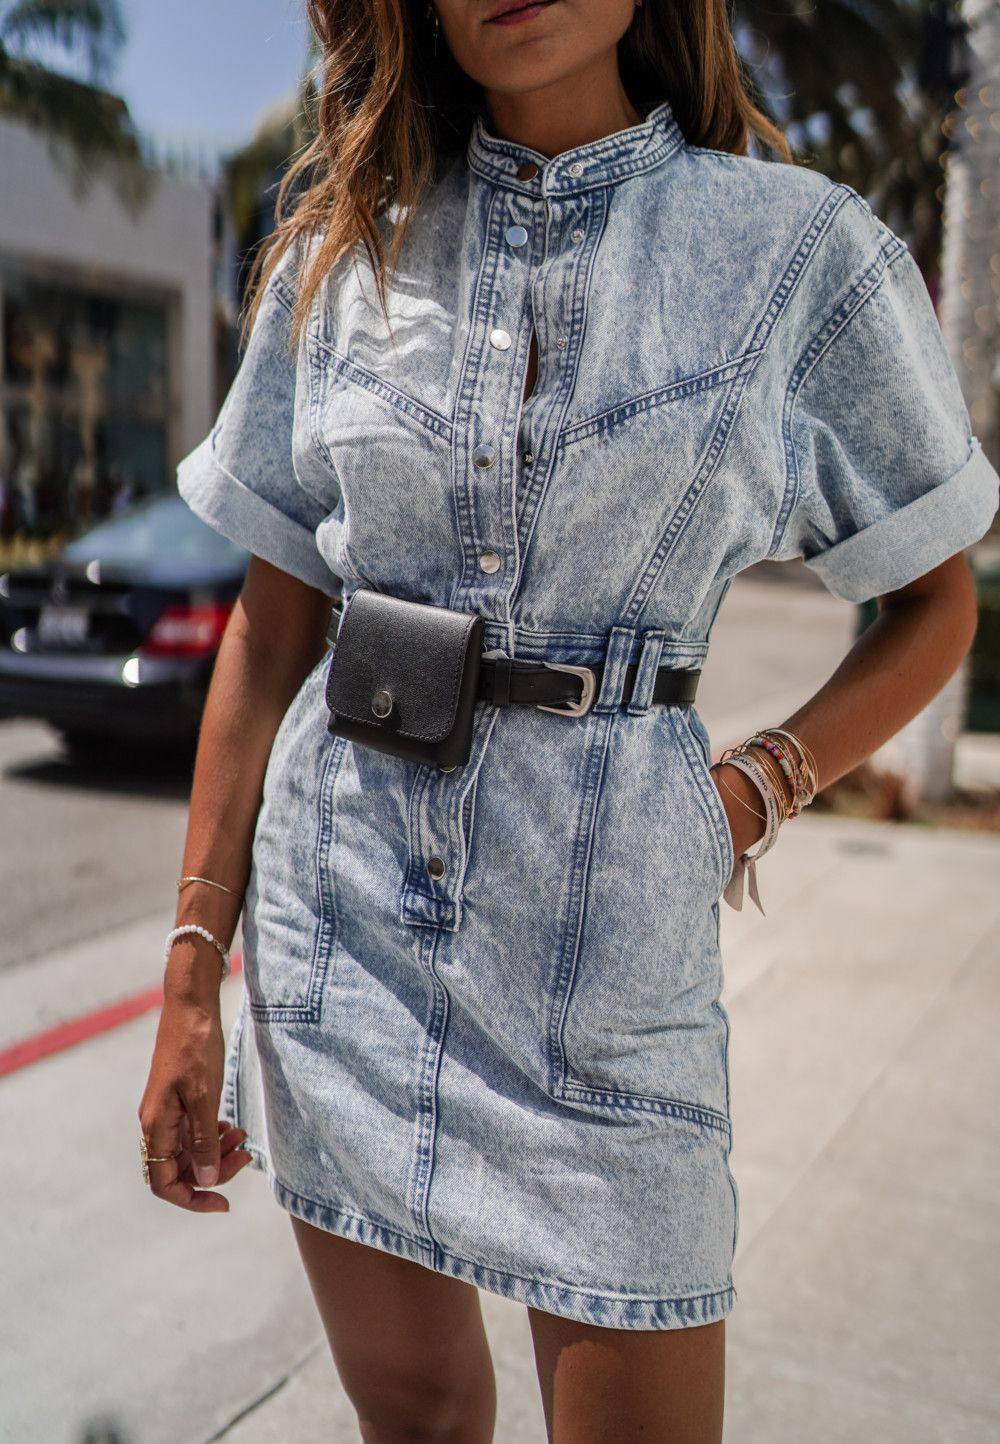 Pin By Allison Wetig On Junesixtyfive Denim Dress Outfit Jean Dress Outfits Denim Mini Dress [ 1444 x 1000 Pixel ]